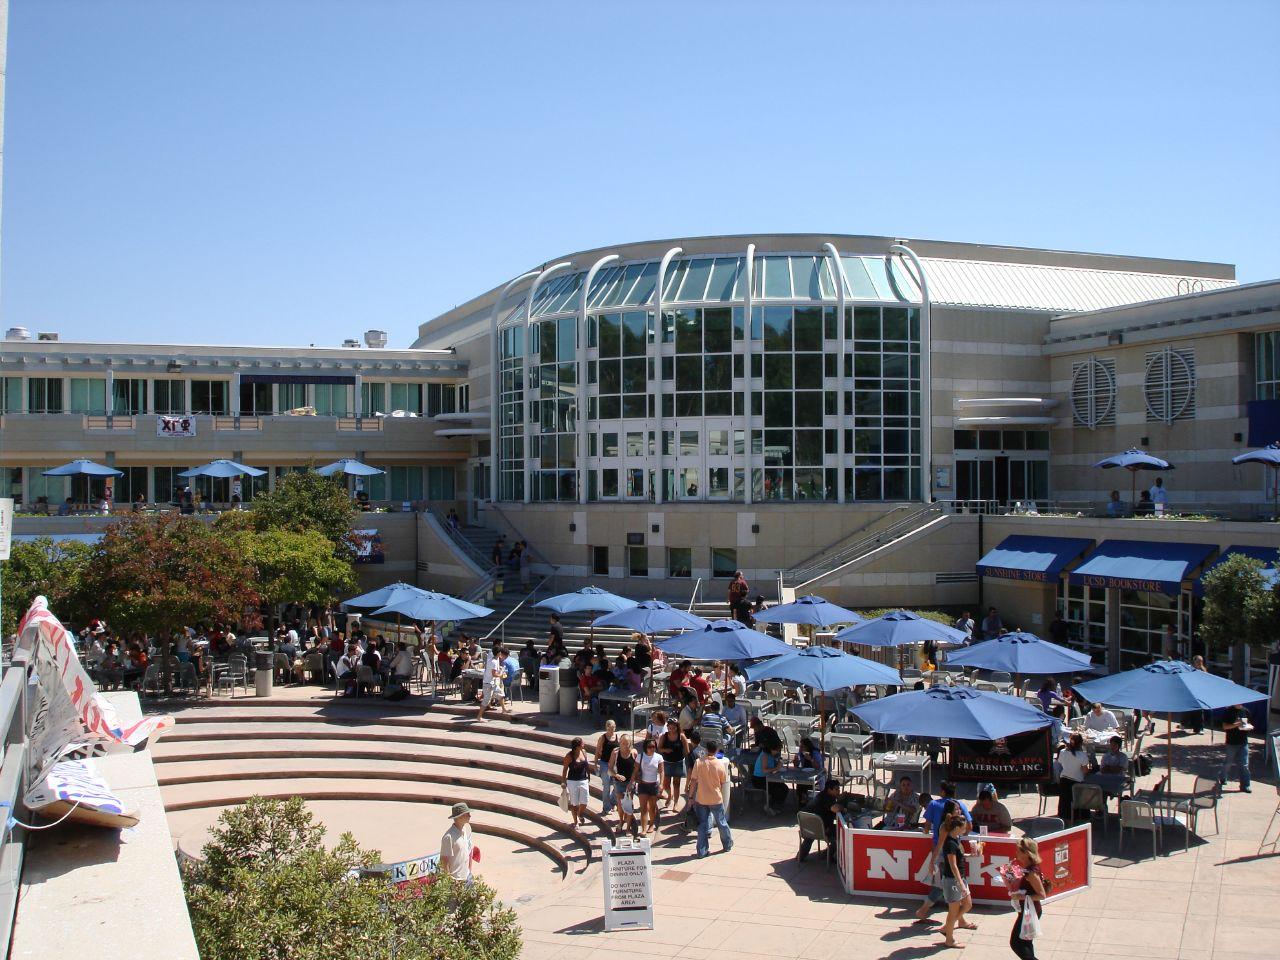 university of california san diegoカリフォルニア大学 サンディエゴ校